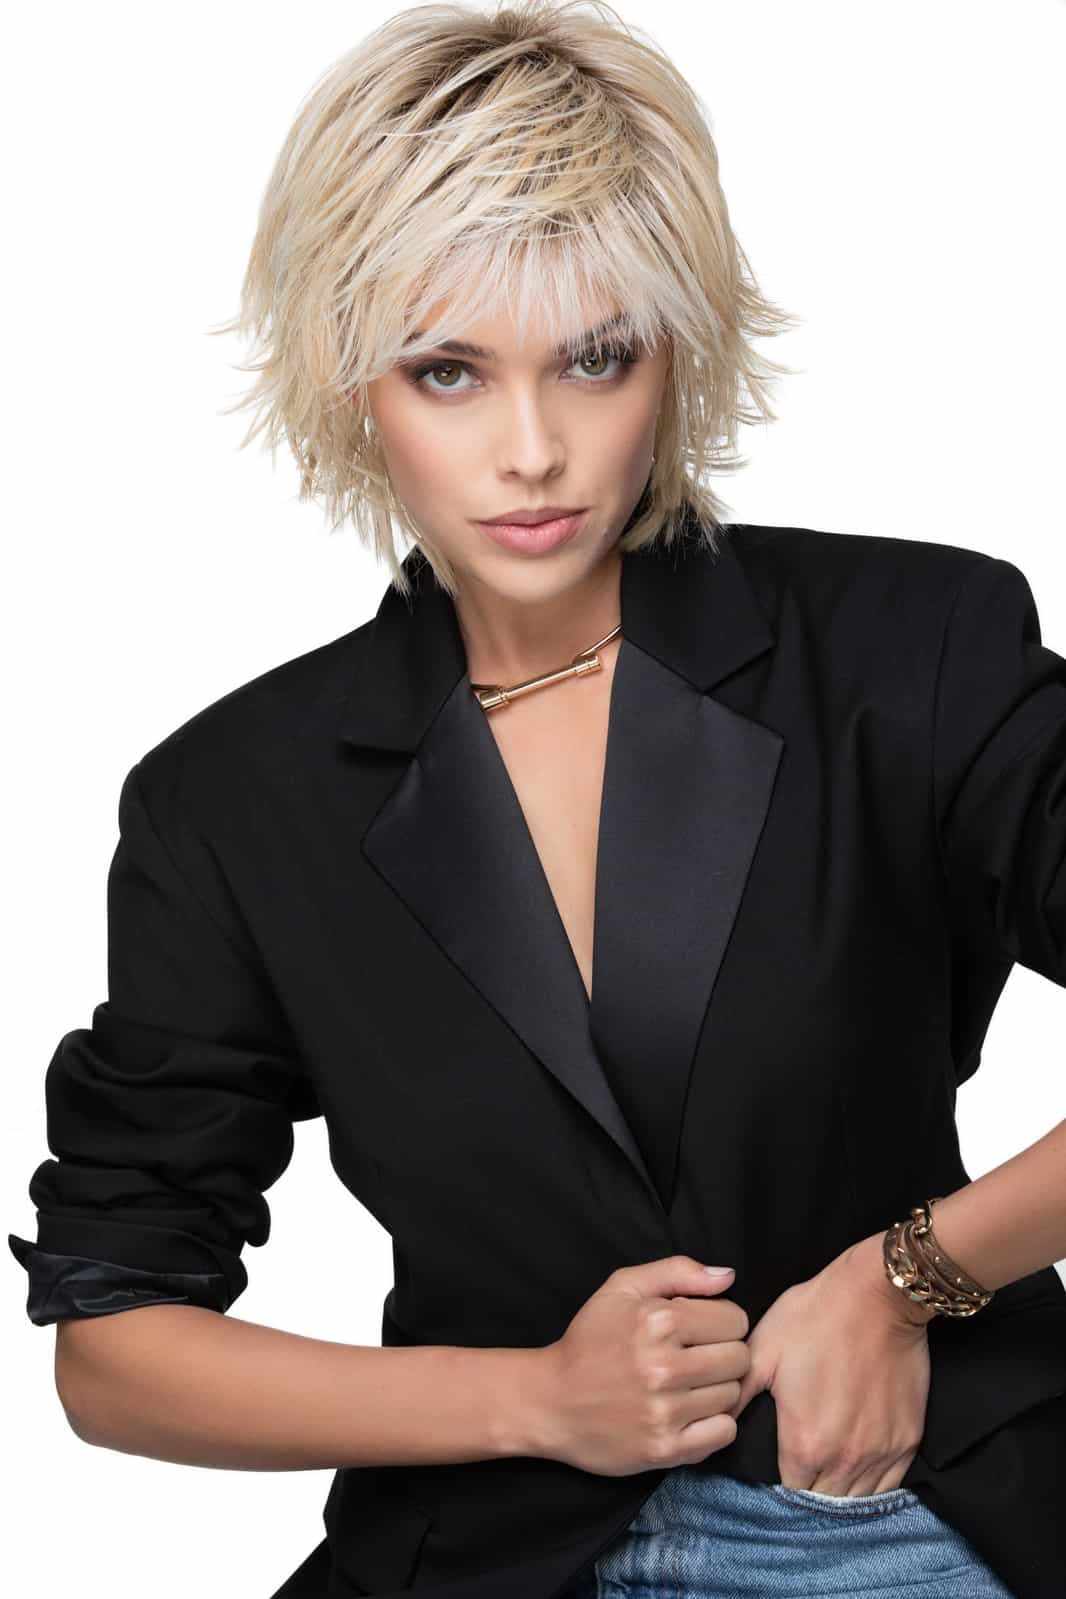 Razor Cut Shag : Ready-To-Wear Wigs   TressAllure